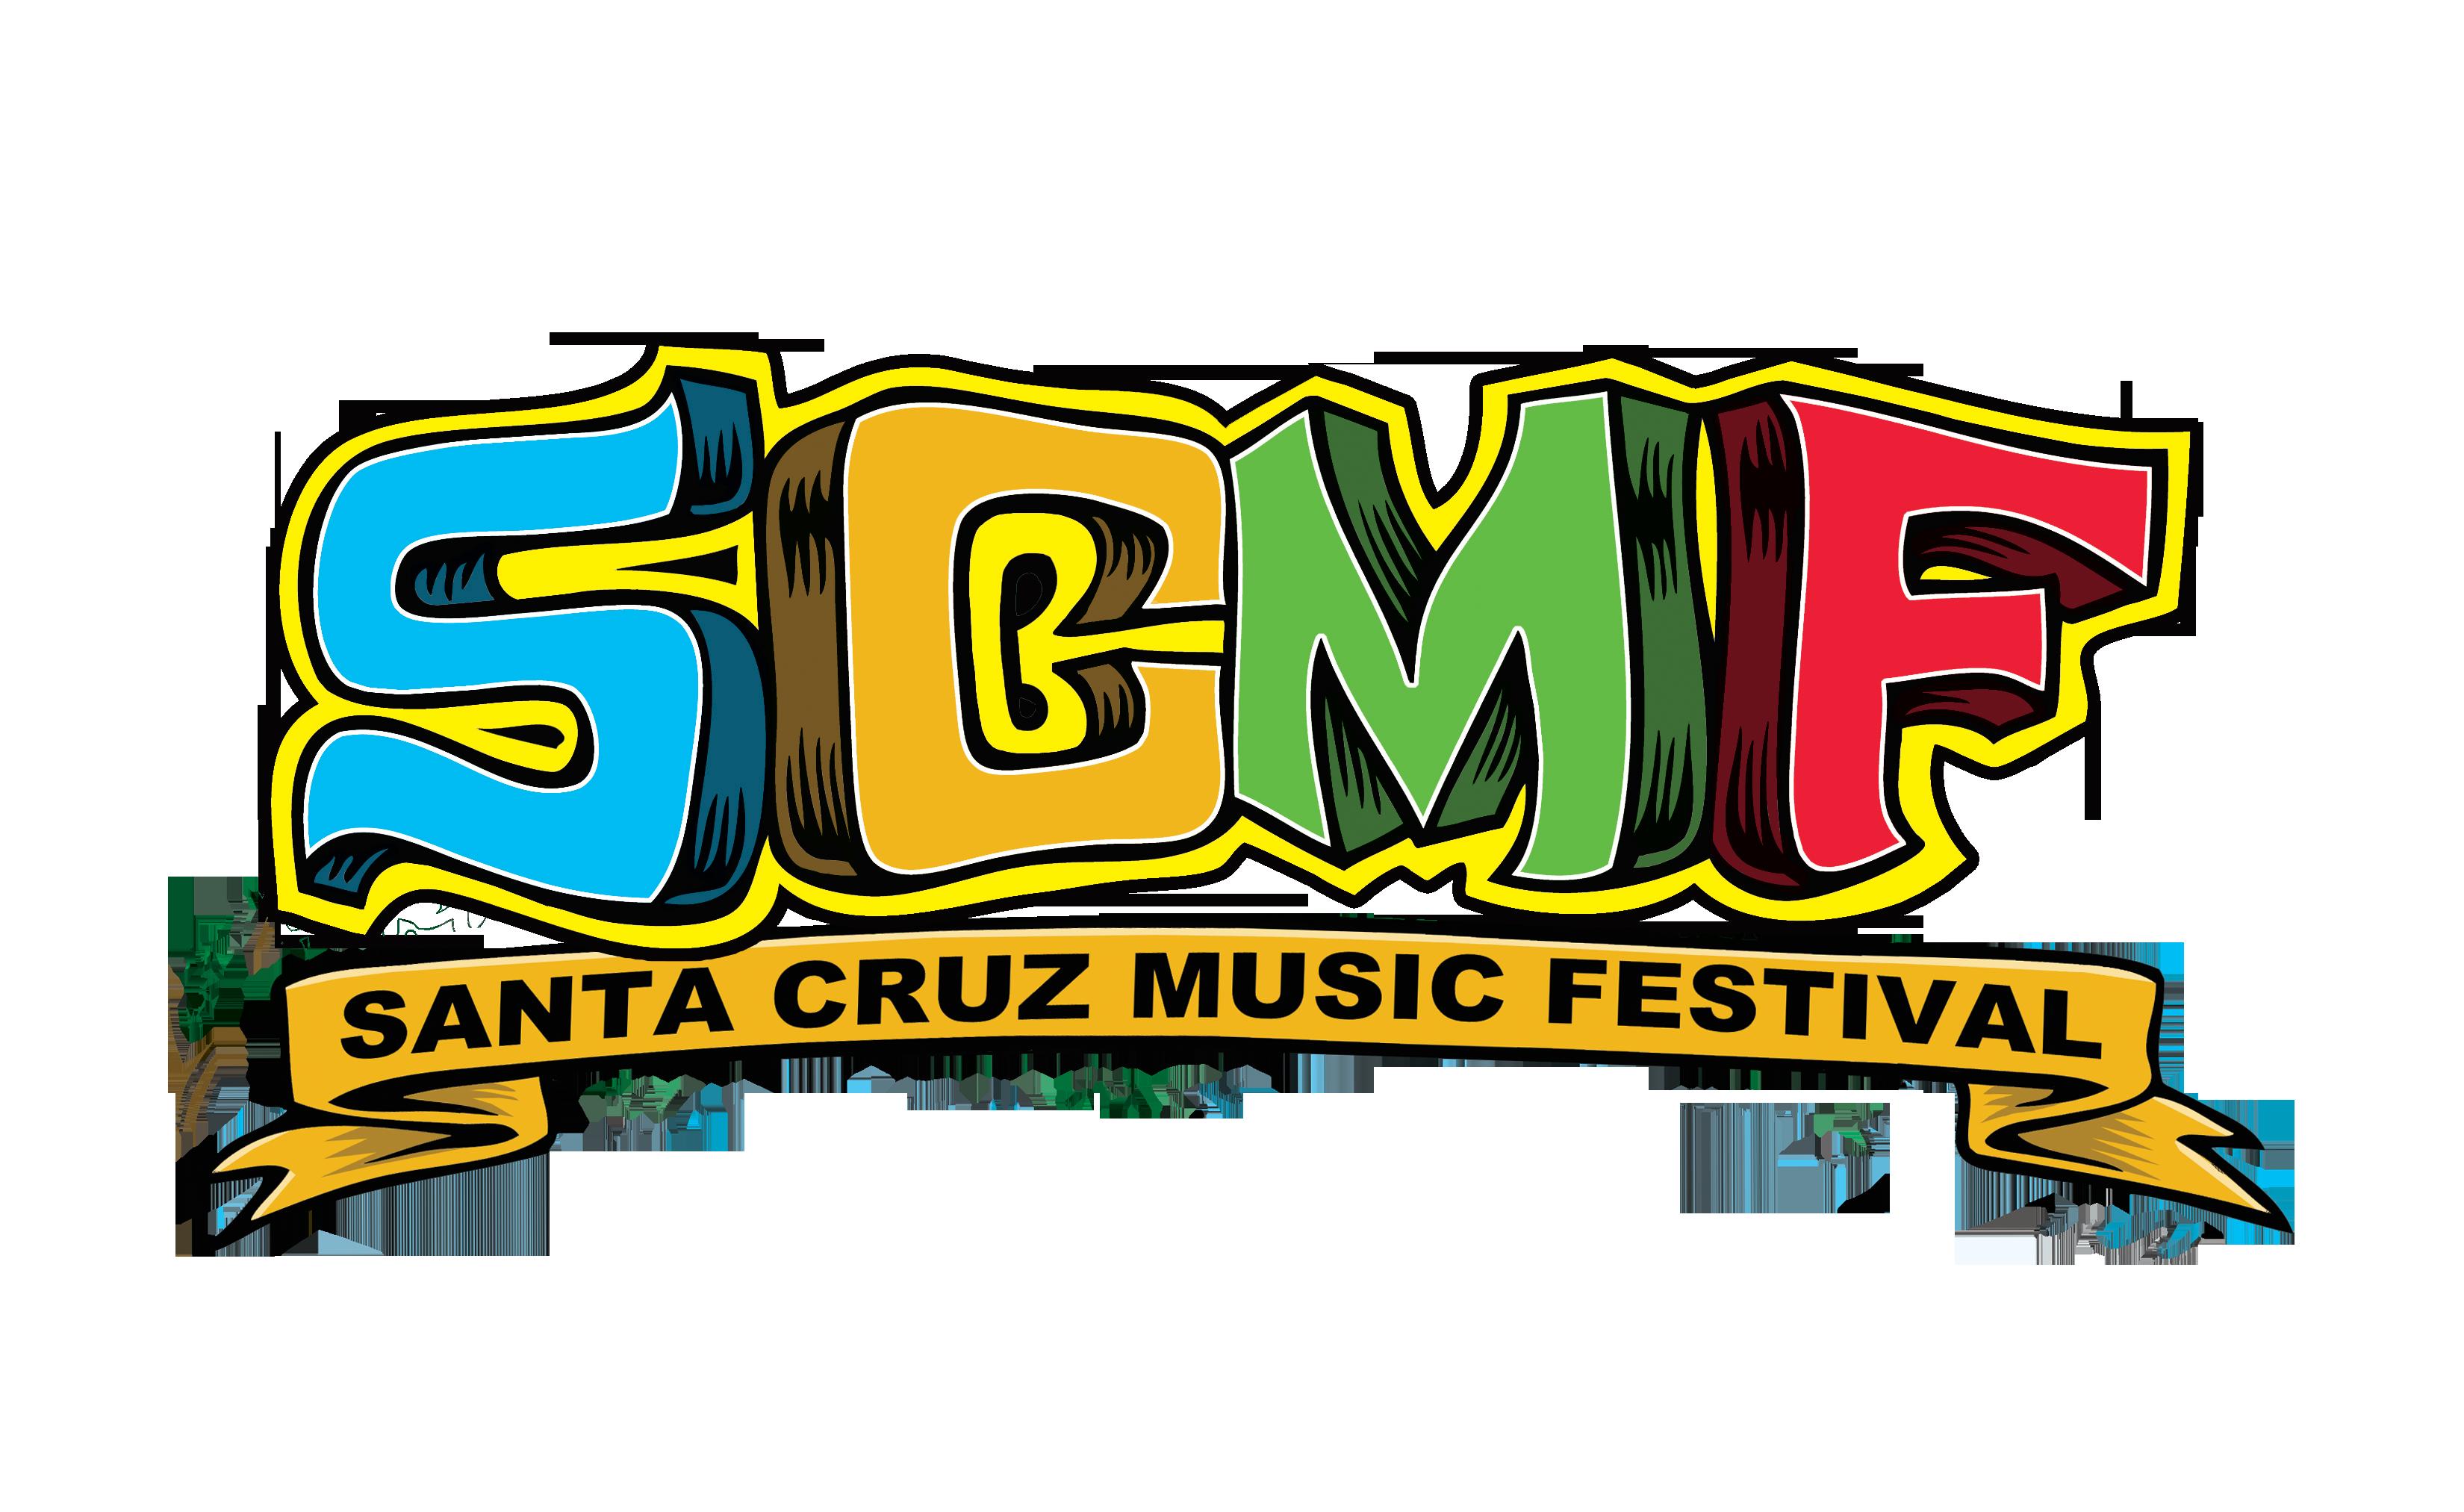 Festival clipart festival banner. Santa cruz music faq